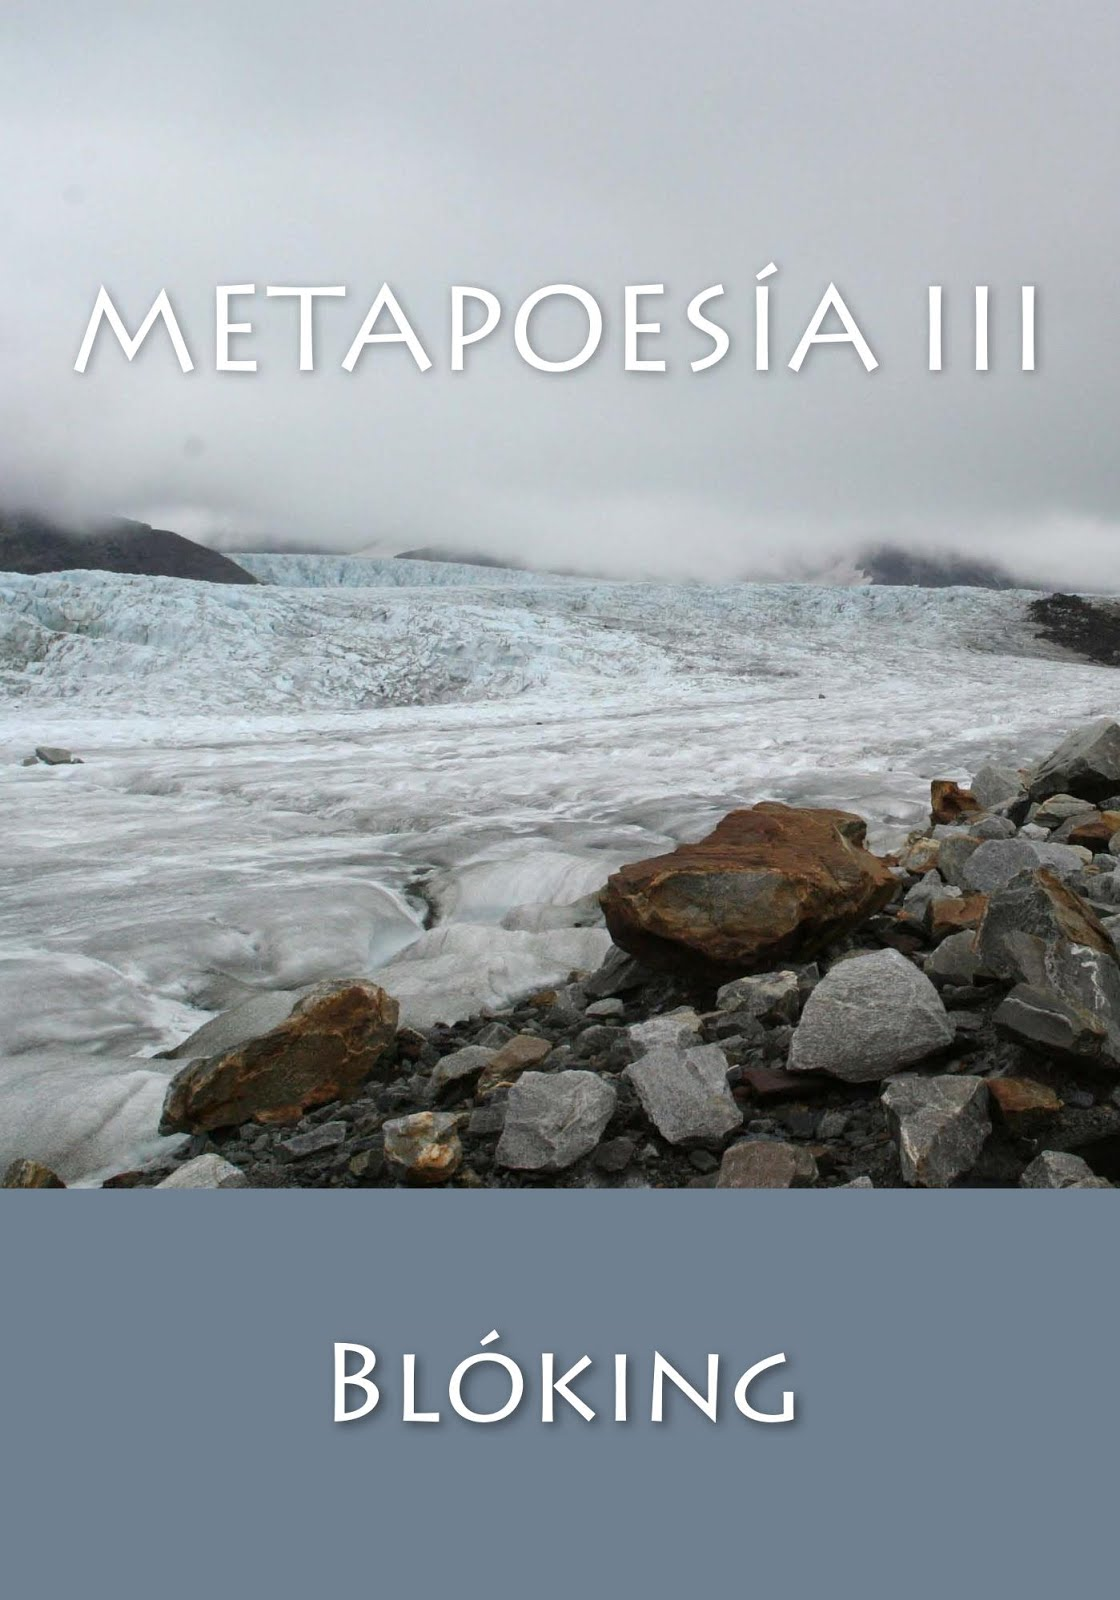 #Obra 33 - Metapoesía III